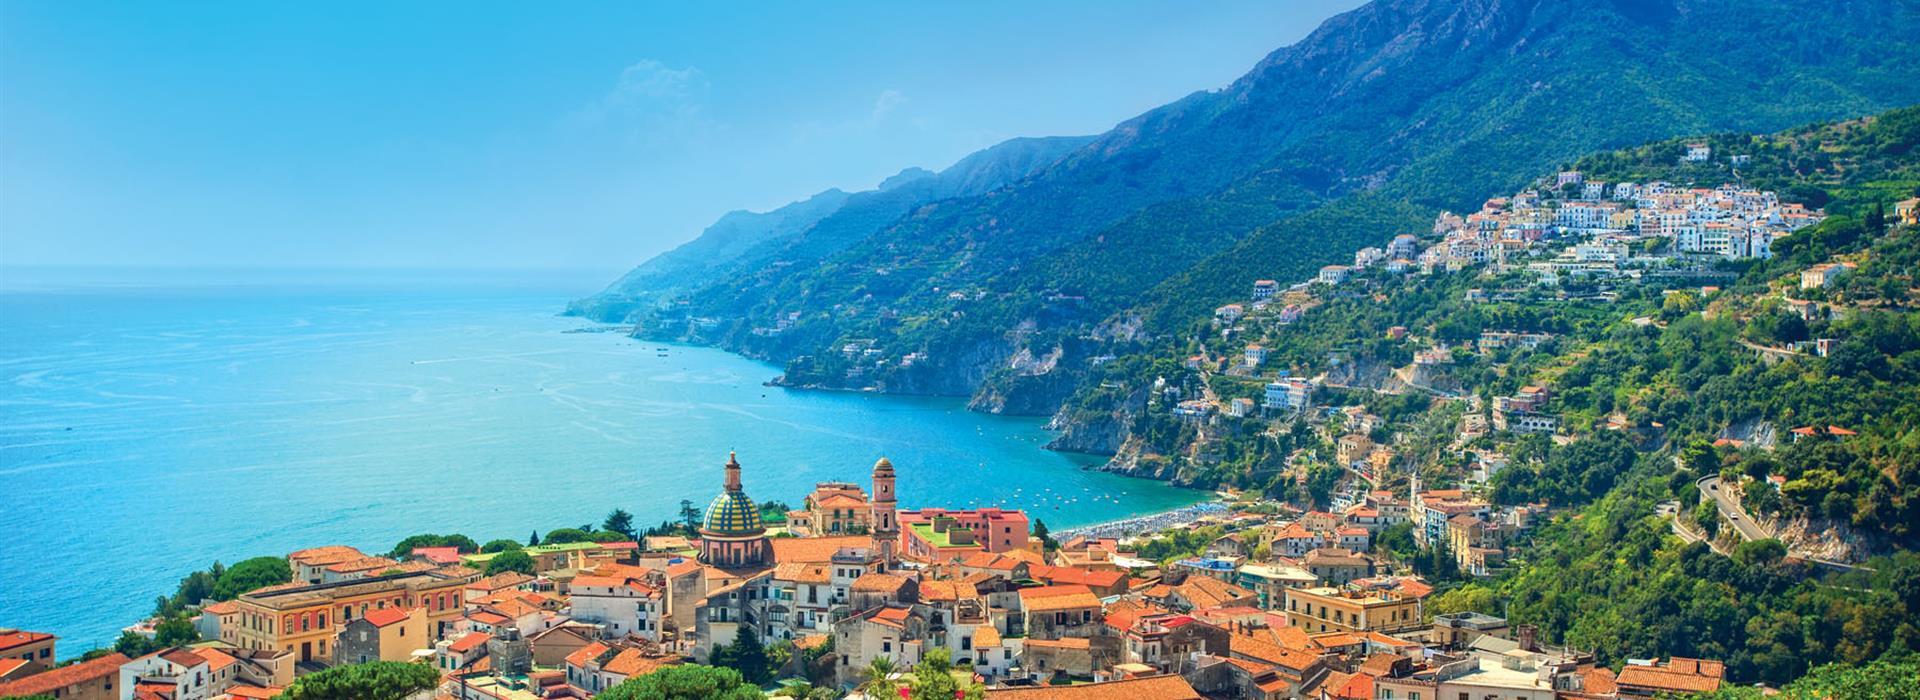 Italy-Salerno_86479273